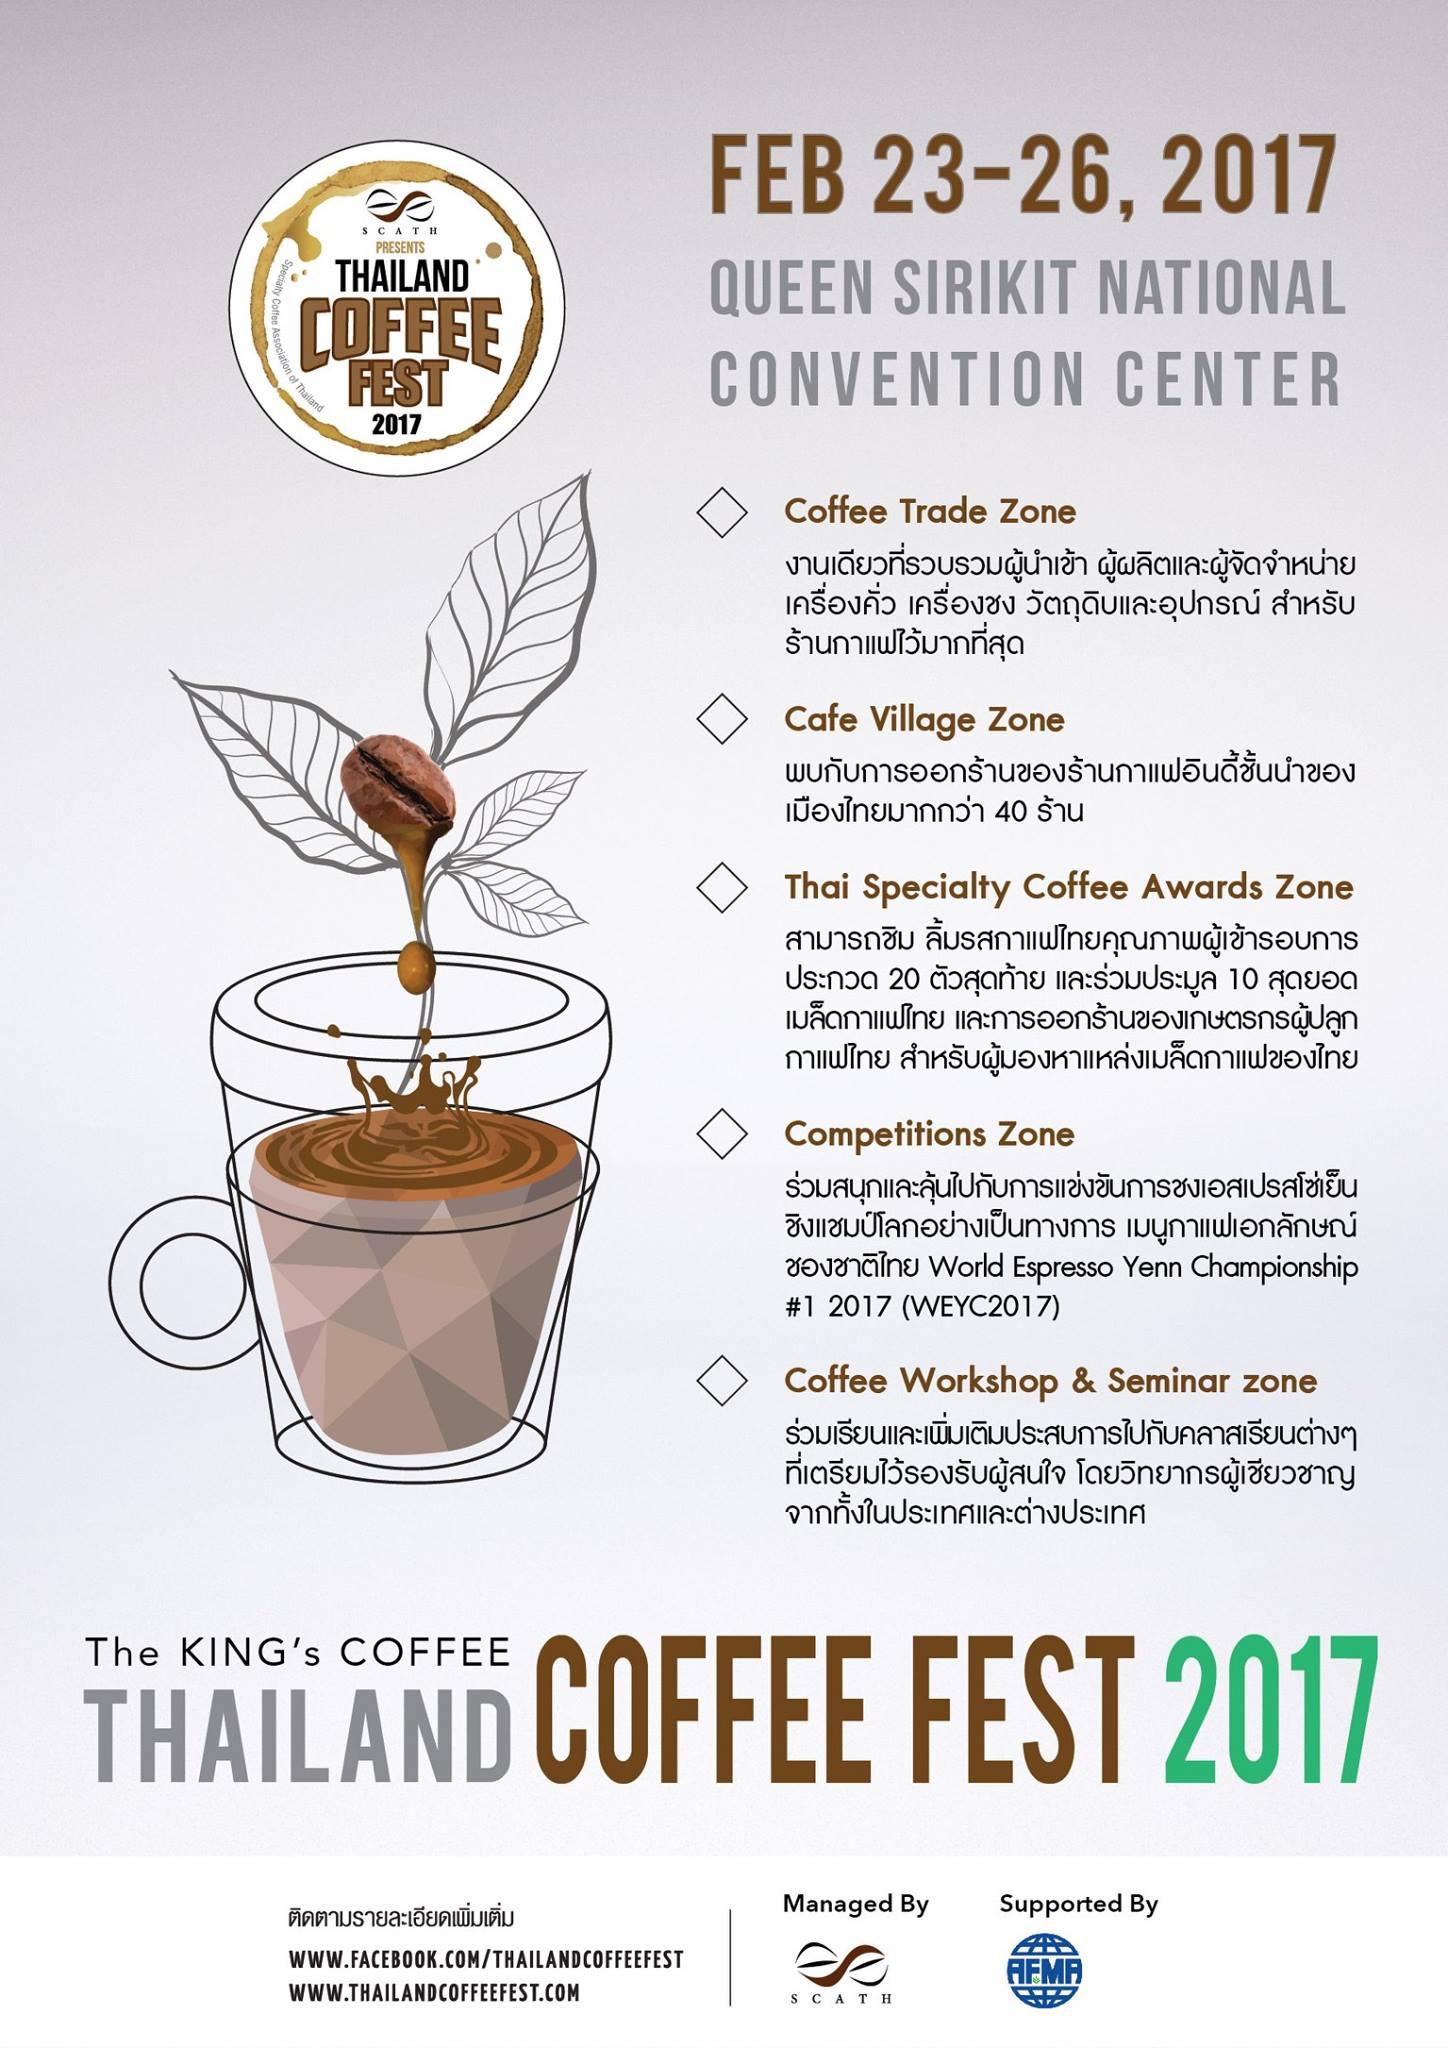 Thailand Coffee Fest 2017